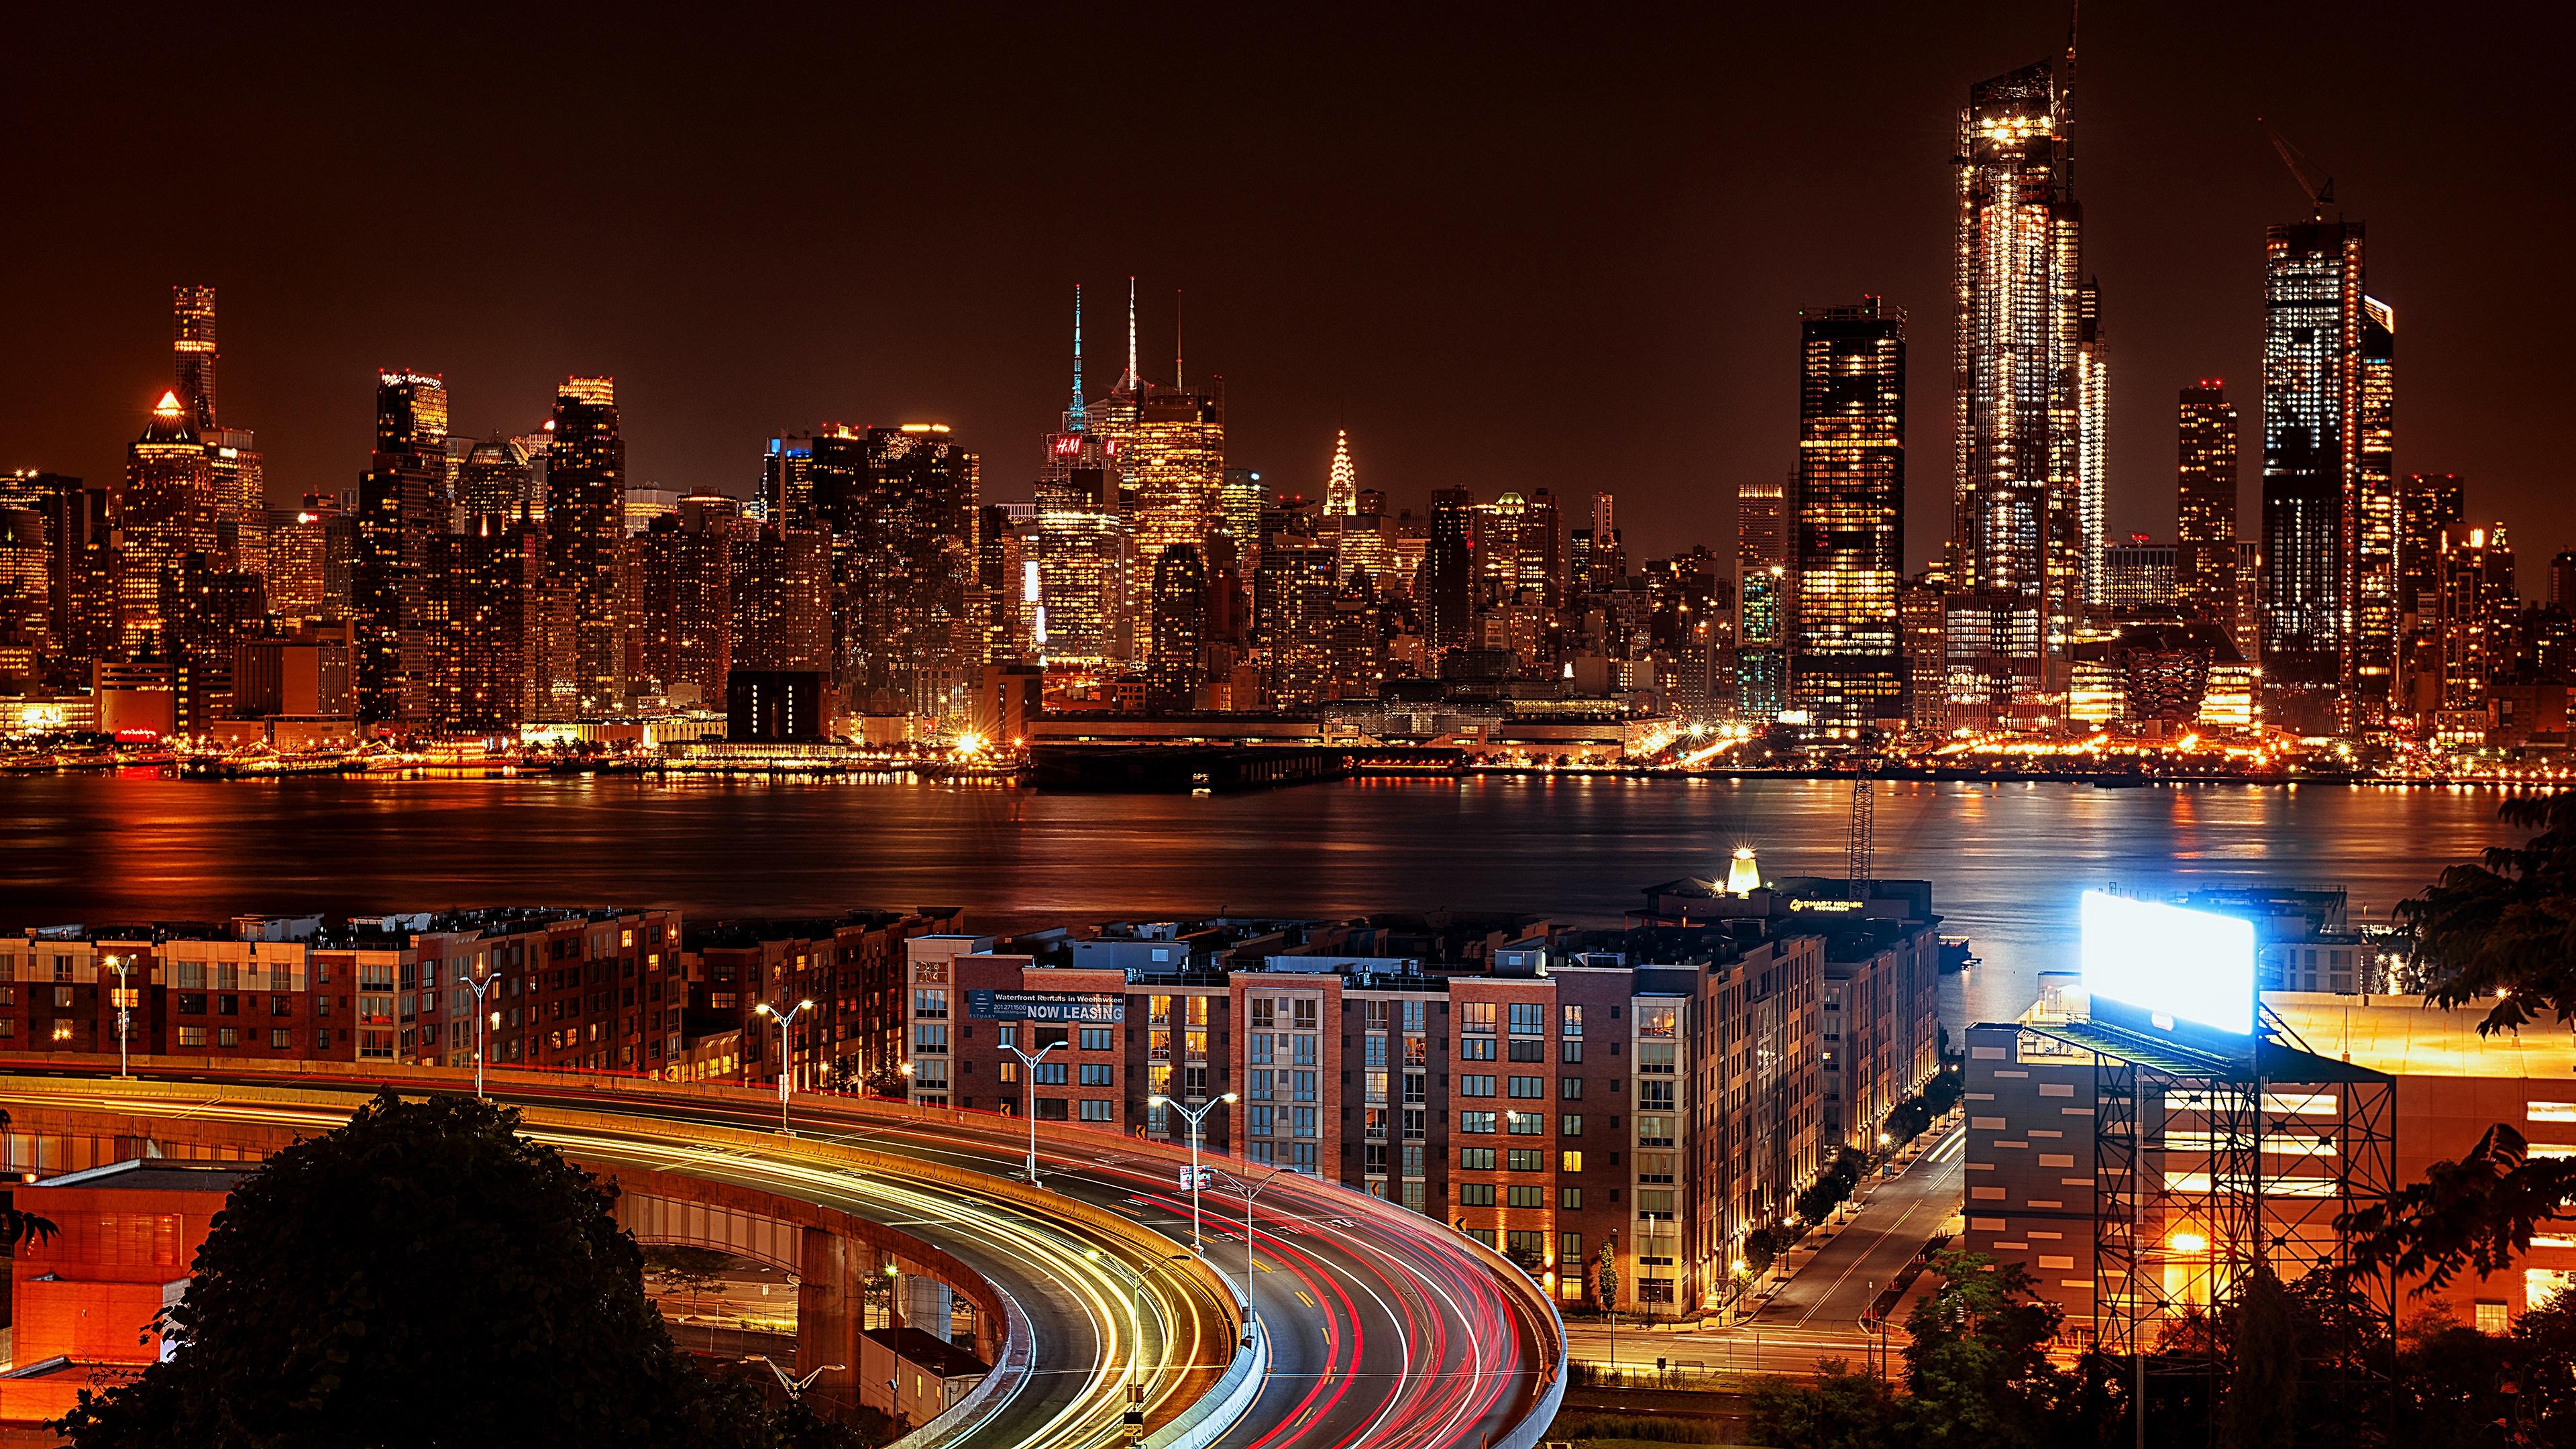 Landscape Portrait - New York City Night View Hd , HD Wallpaper & Backgrounds